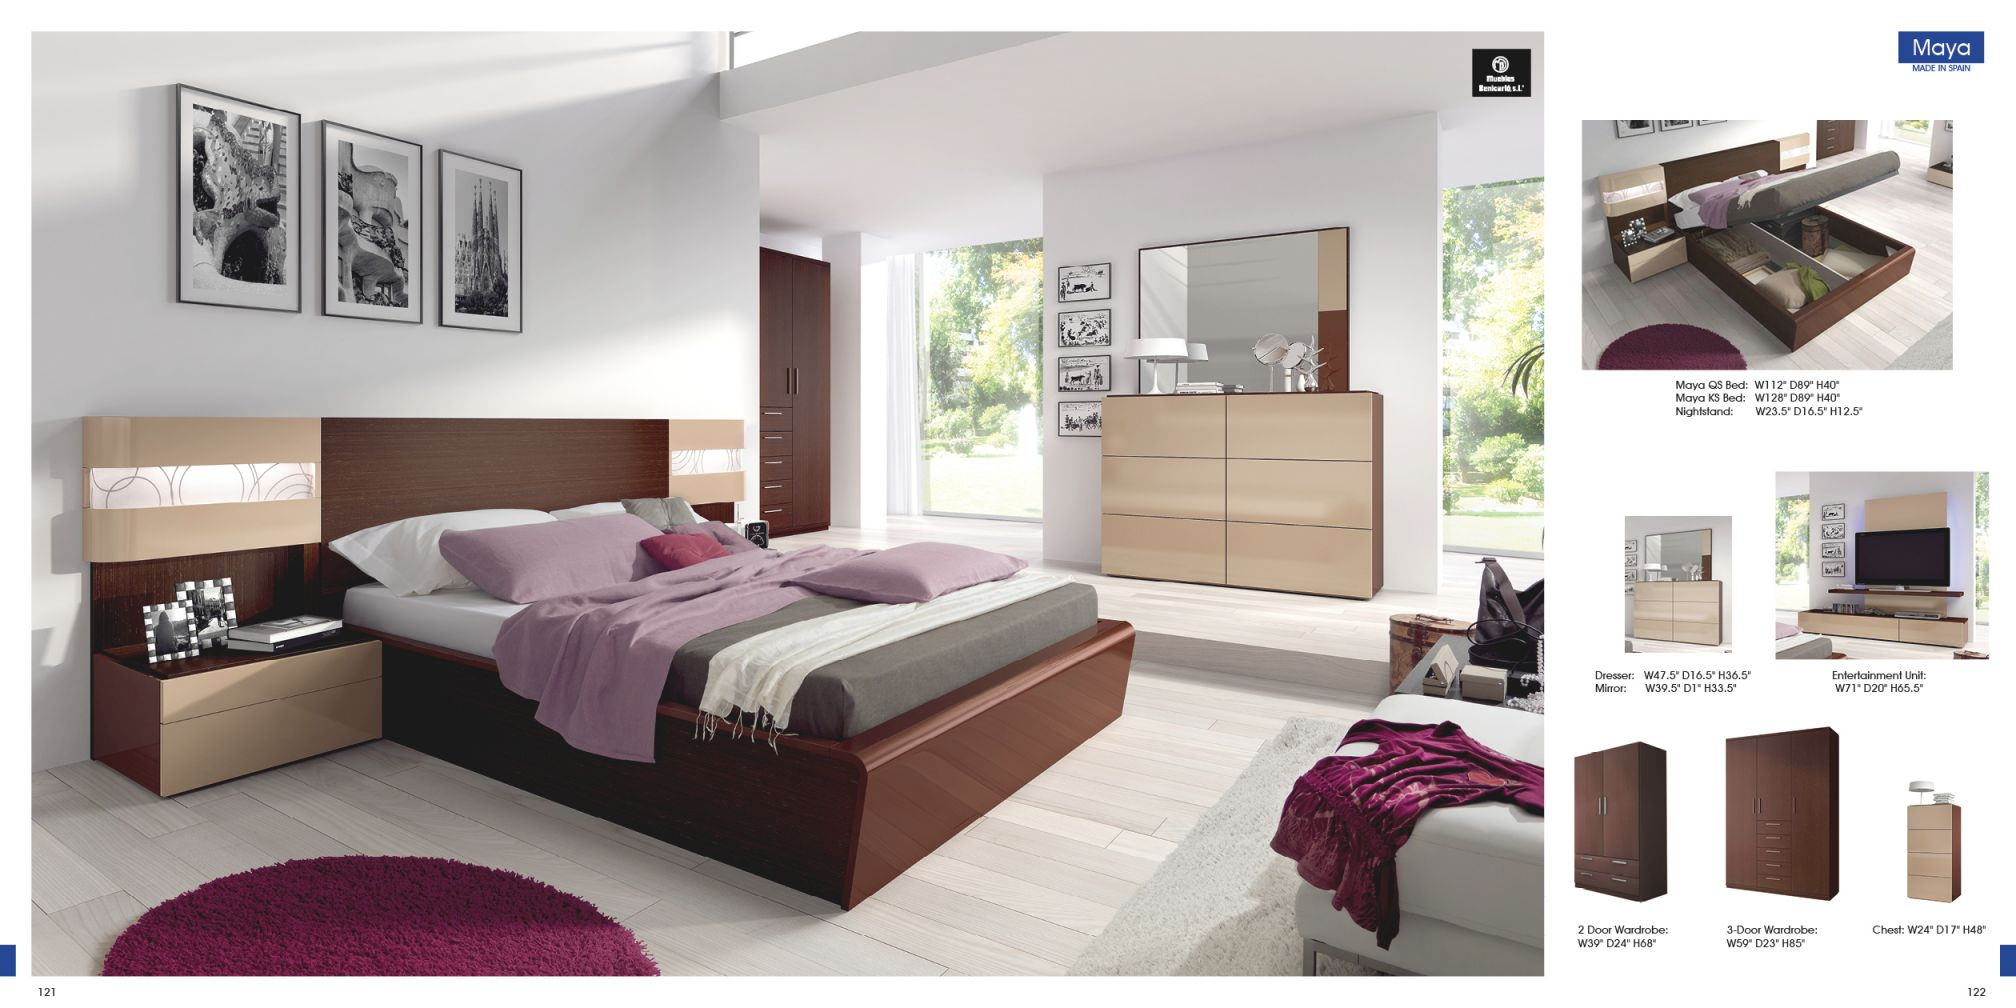 Maya pertaining to Modern Bedroom Furniture Sets